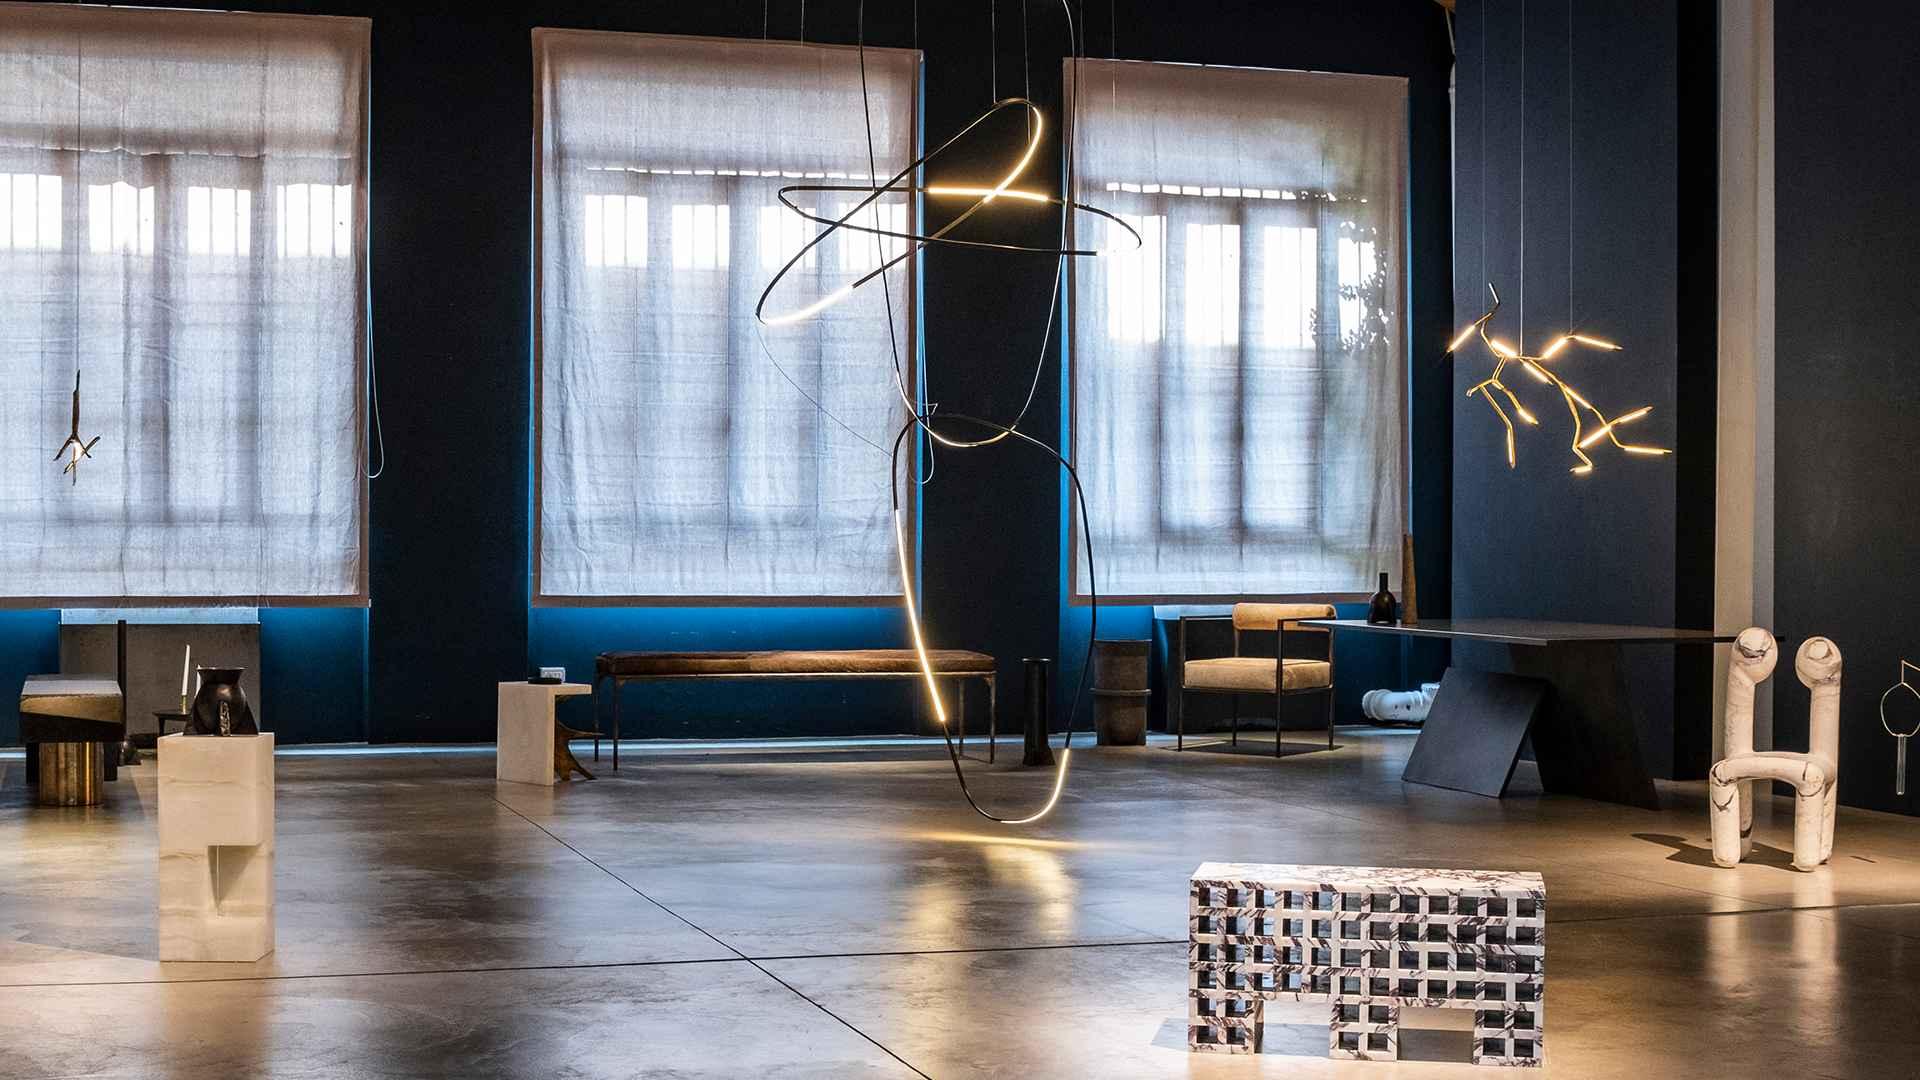 Urania: a robot-sculpted chair by contemporary Italian designer Pietro Franceschini